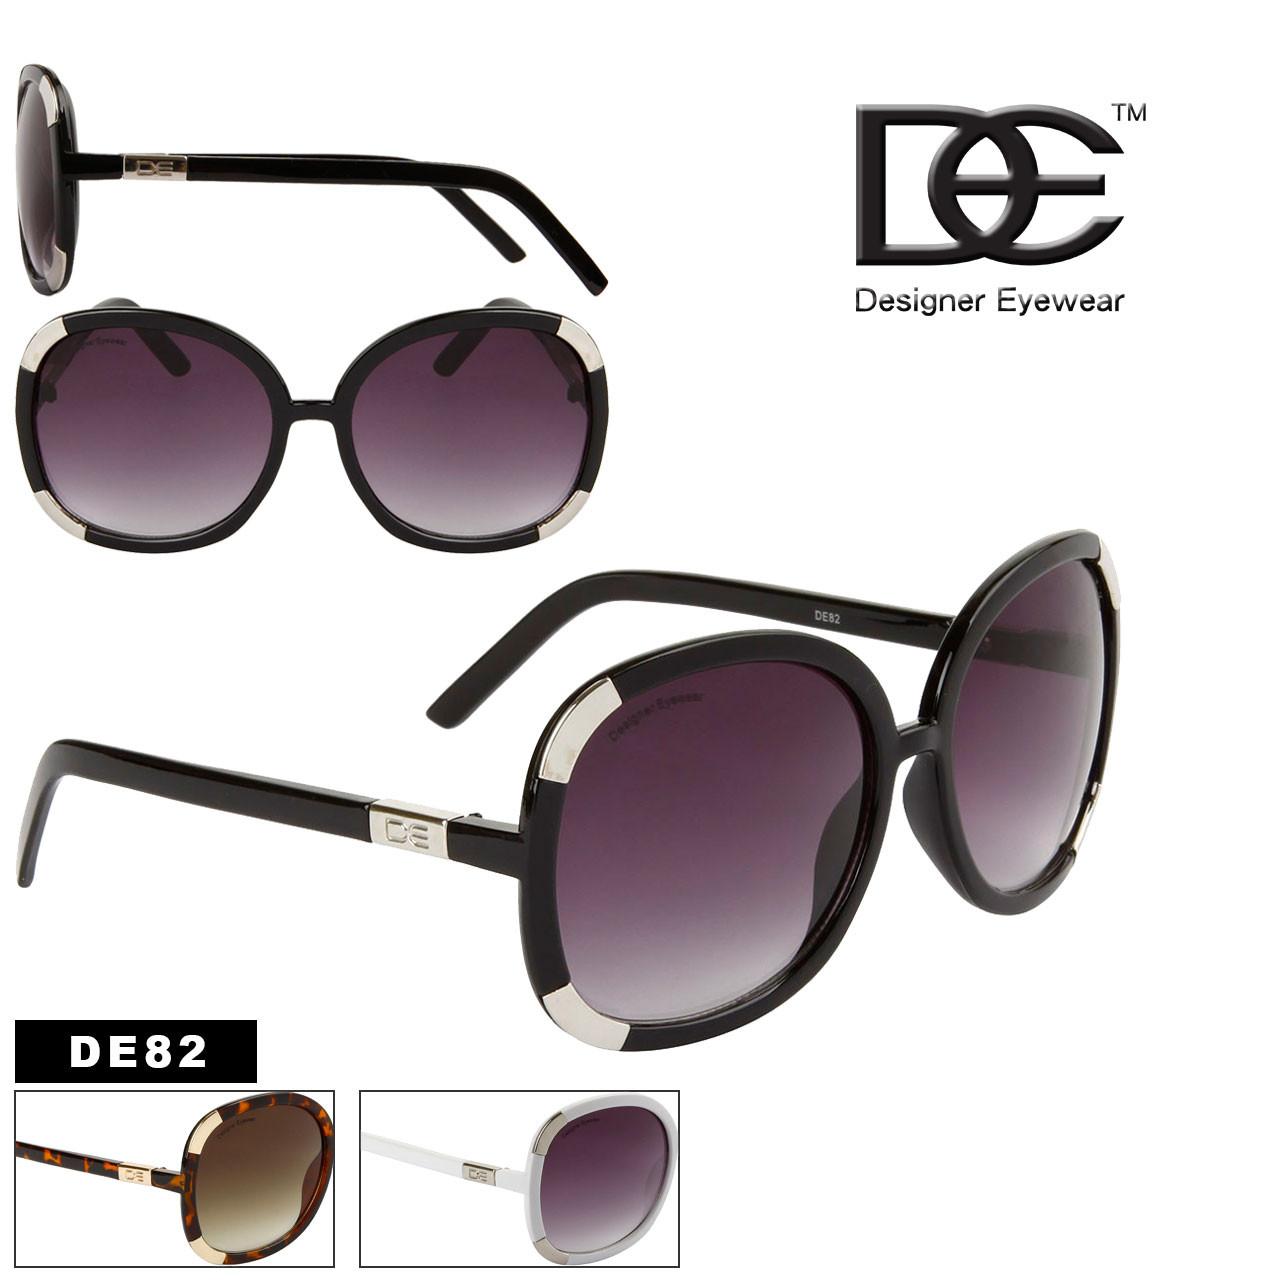 Wholesale Designer Sunglasses - Style# DE82